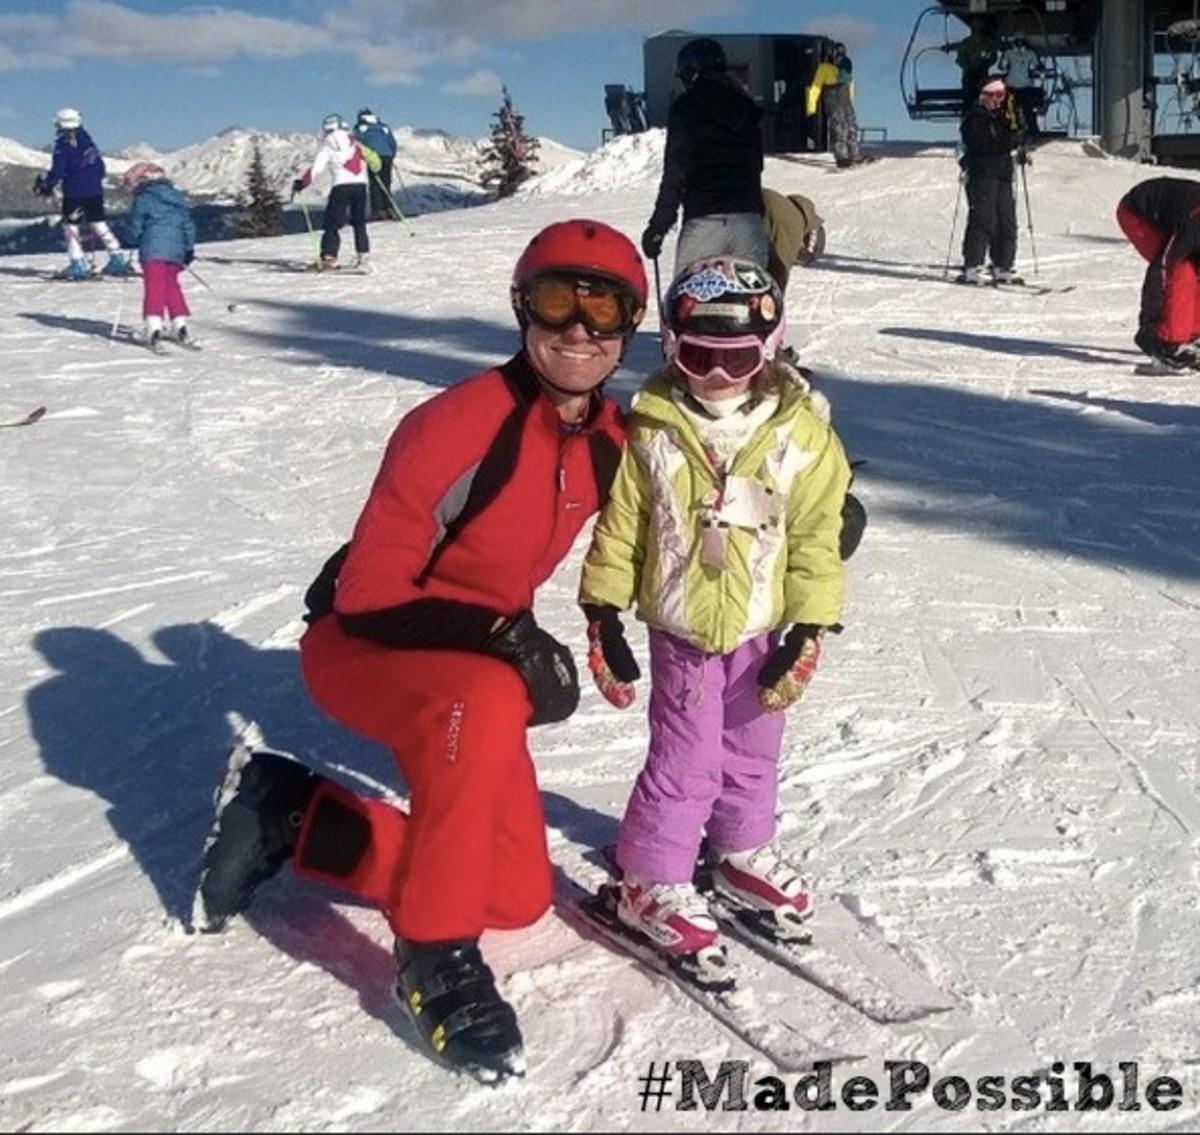 #madepossible ski